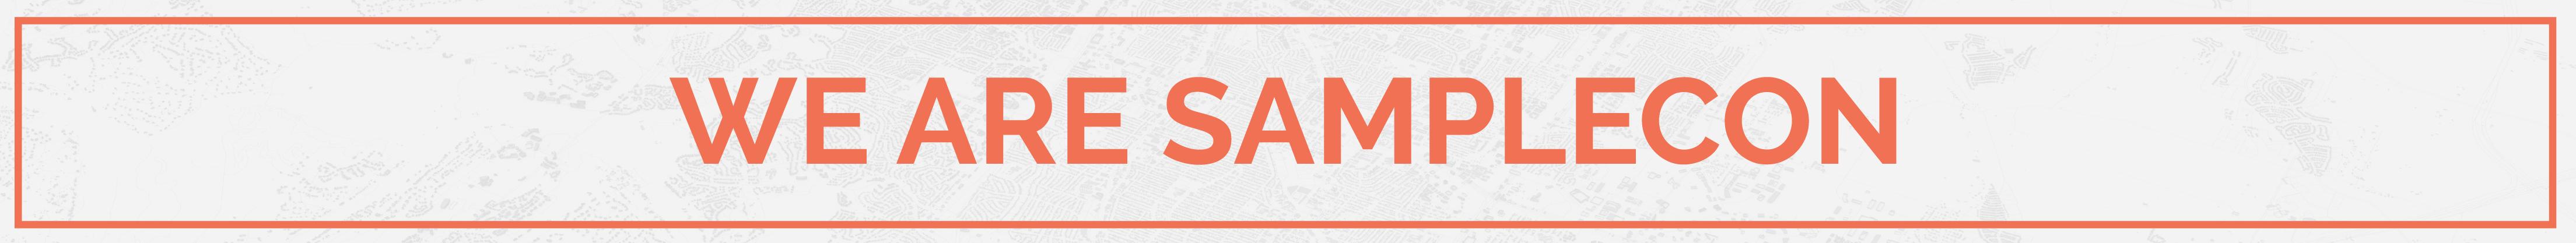 We Are SampleCon